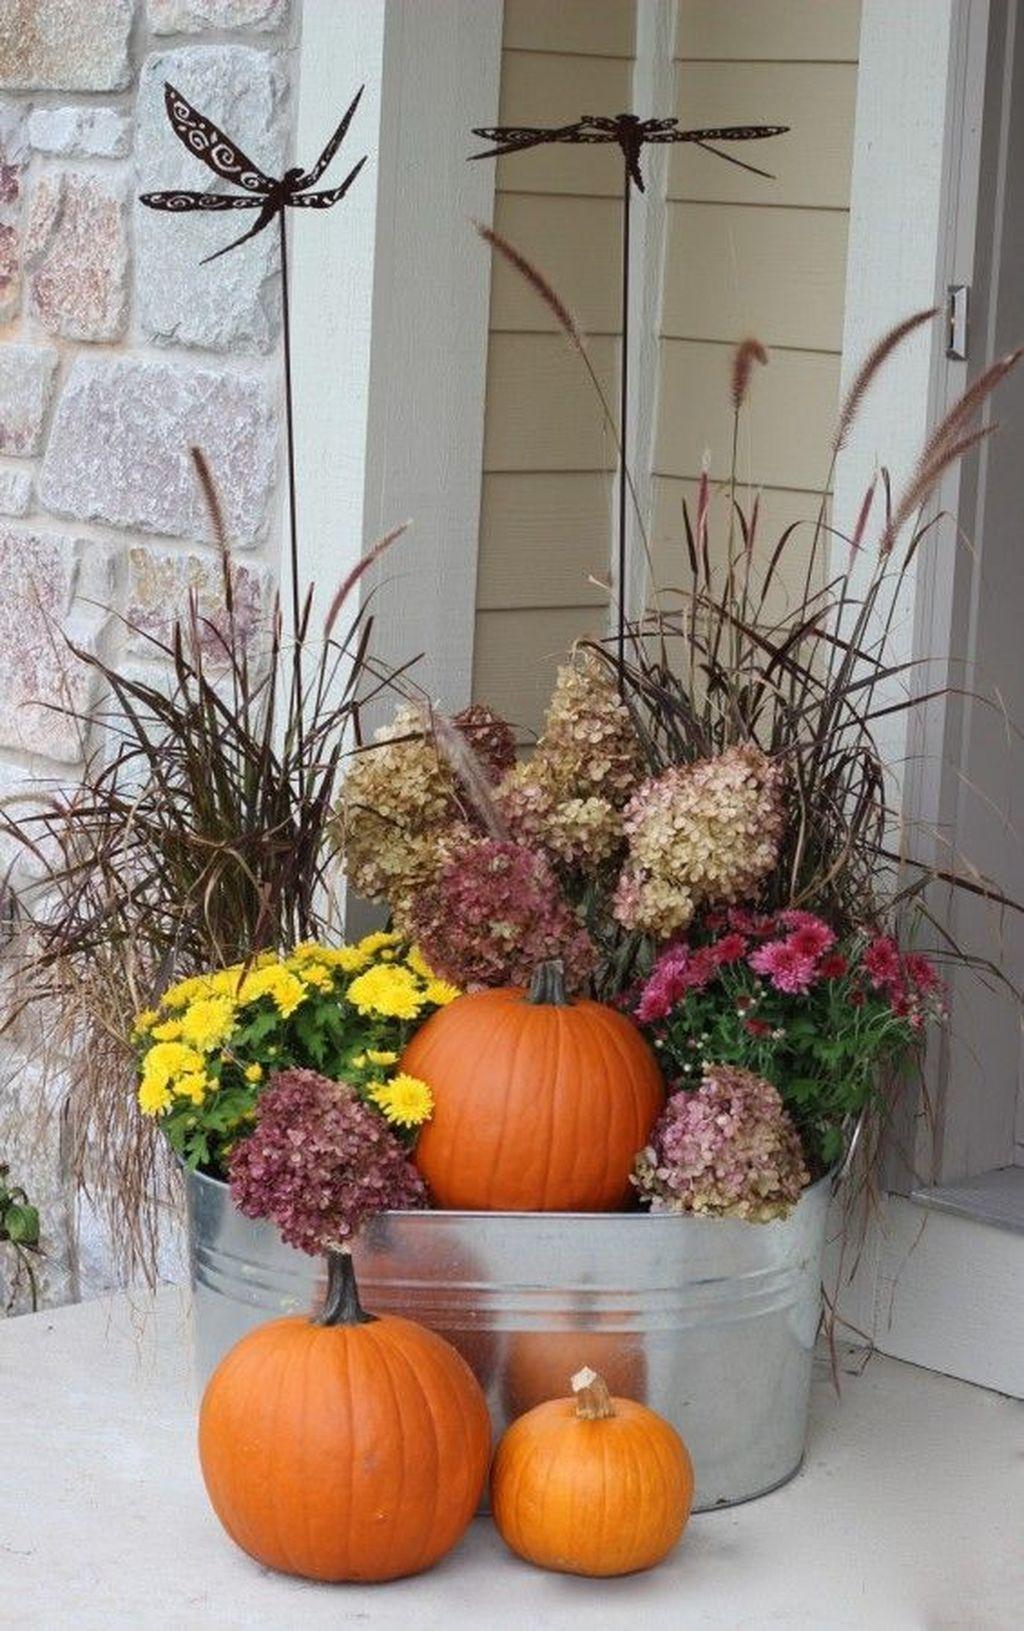 32 Lovely Outdoor Fall Decor Ideas